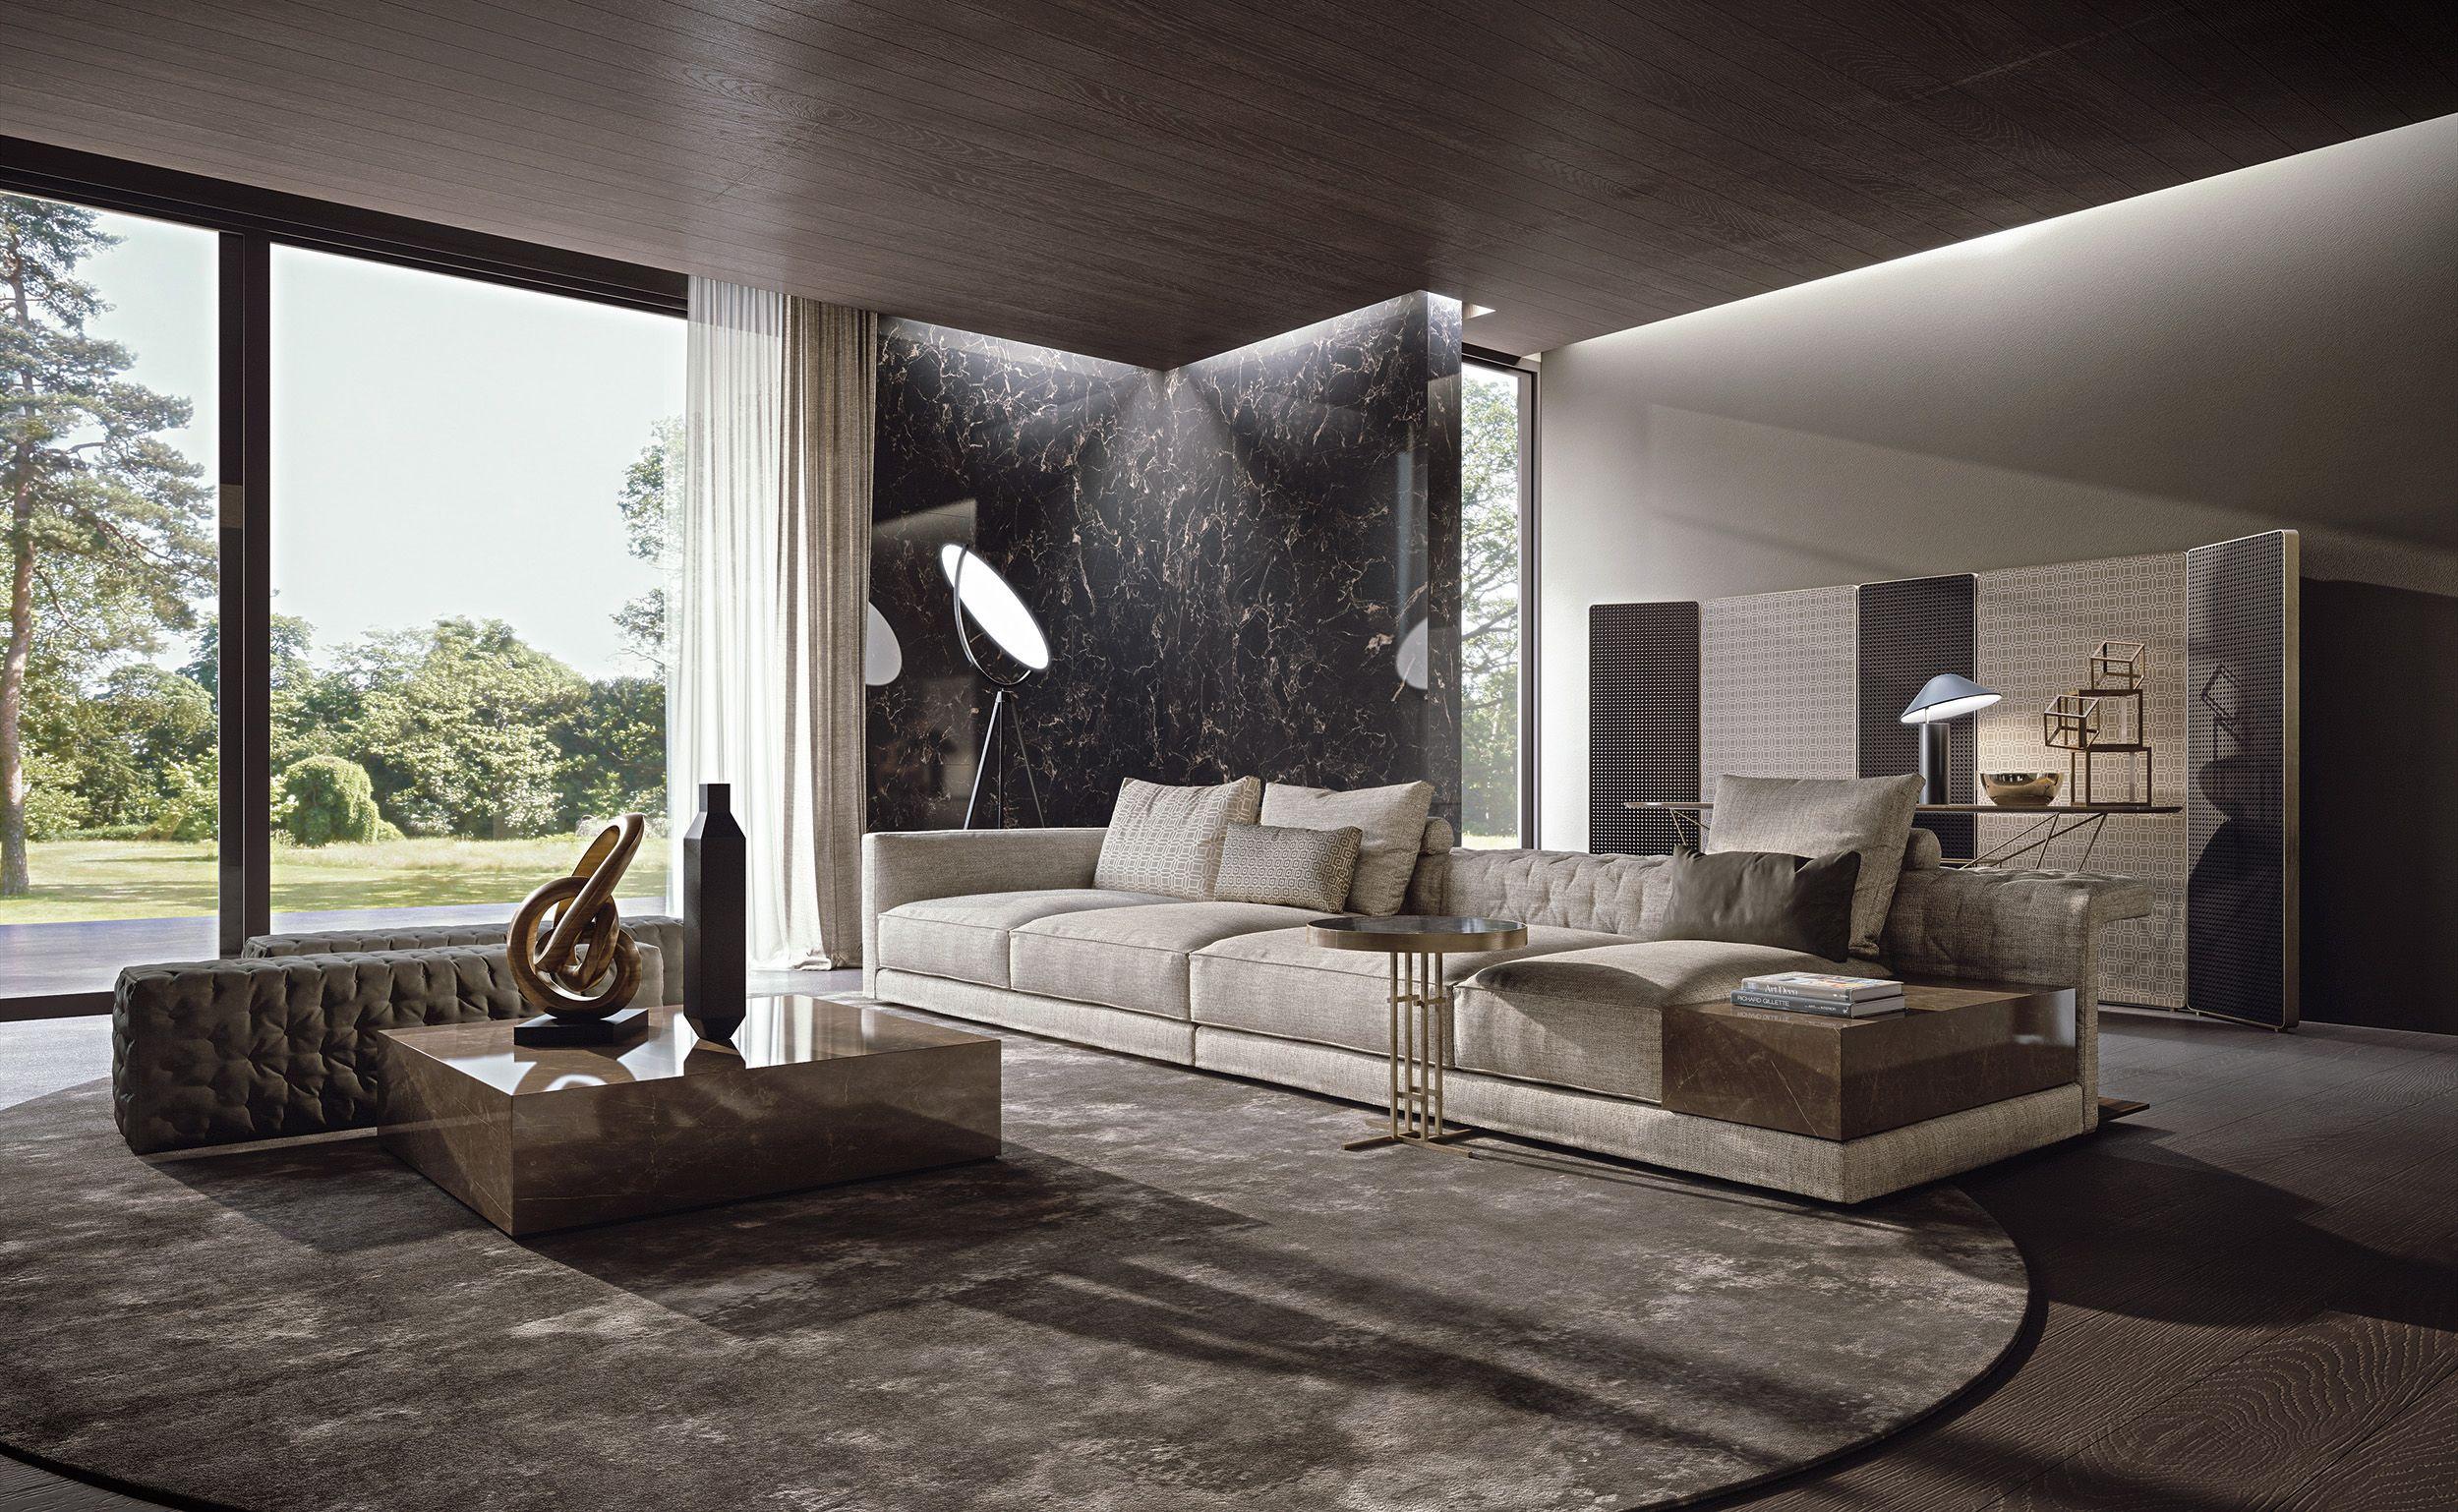 Miller Plain Miller Quilt Sofa Contemporary Furniture Design Furniture Design Contemporary Living Room